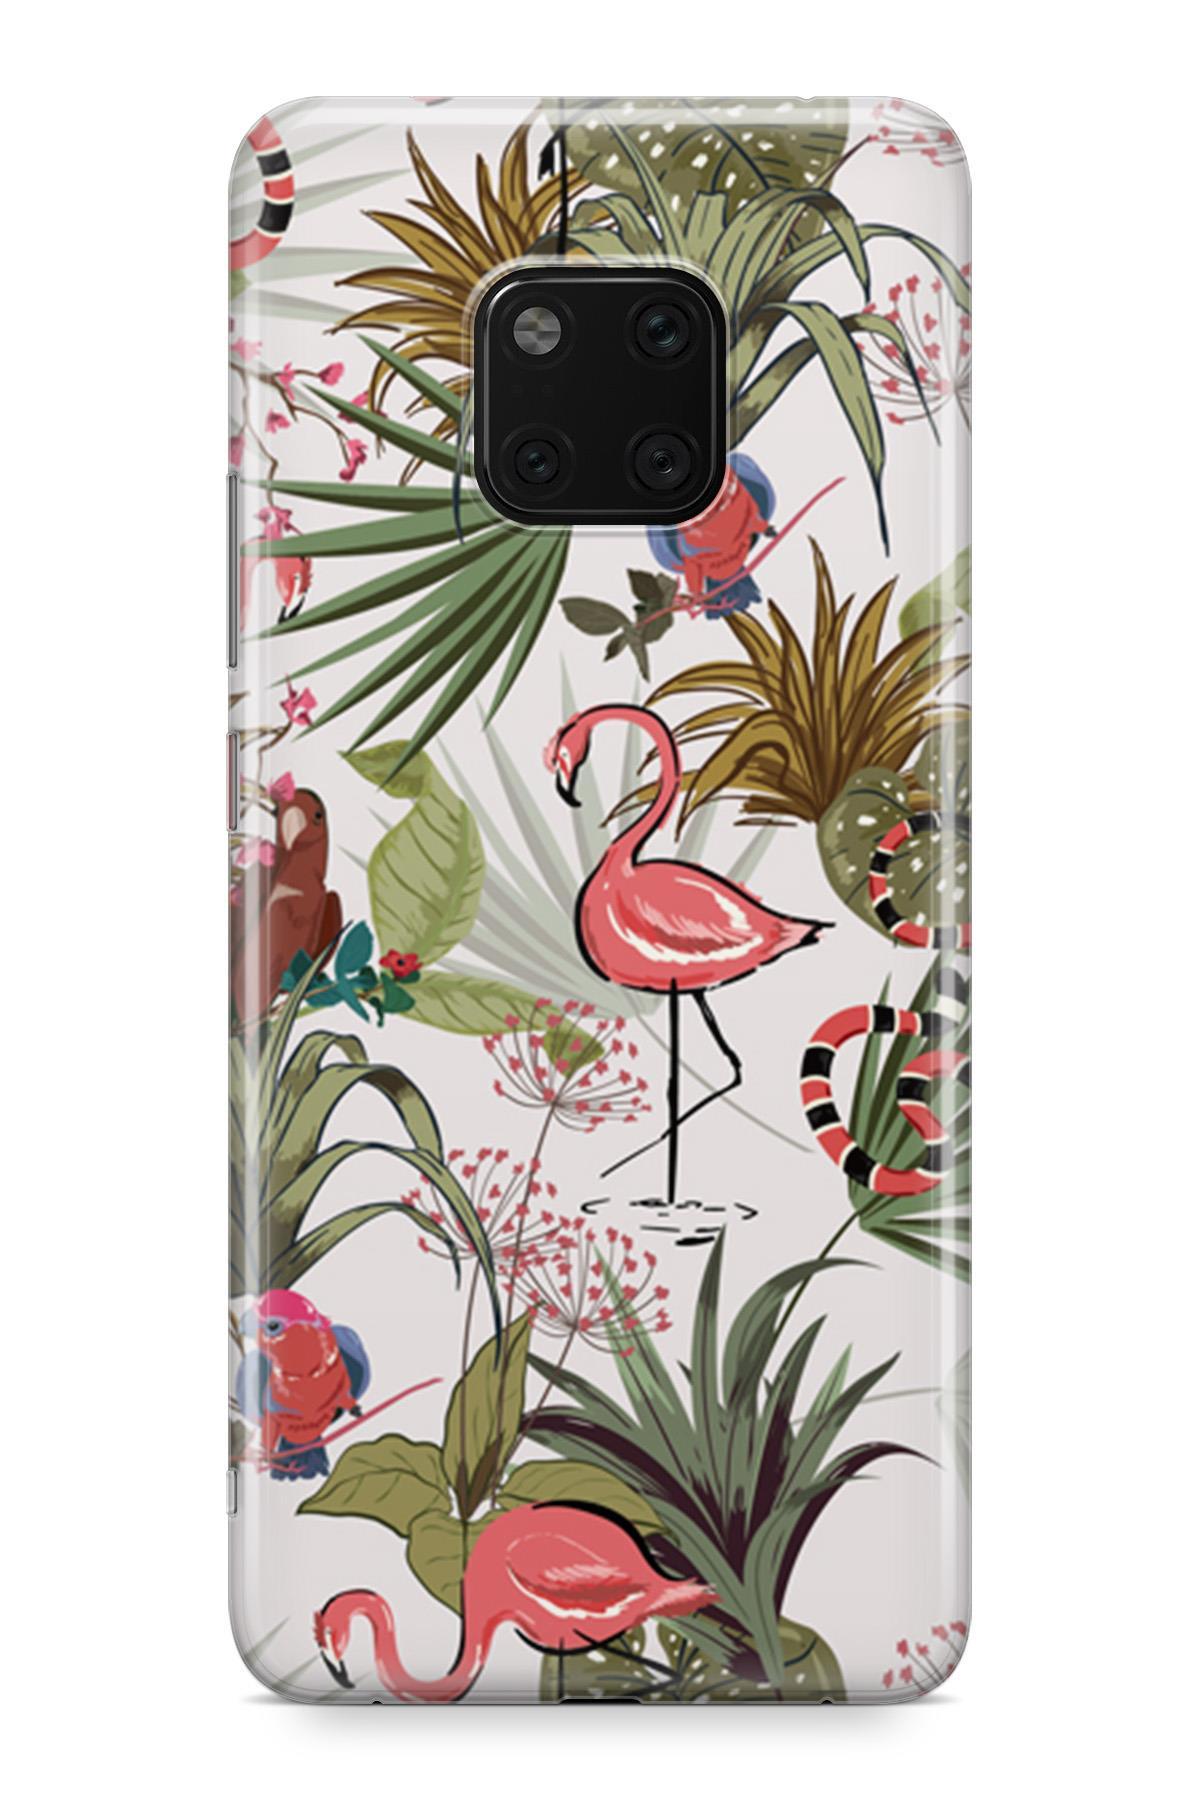 Funda de cuero para Huawei Mate 20 Pro Serie jungla